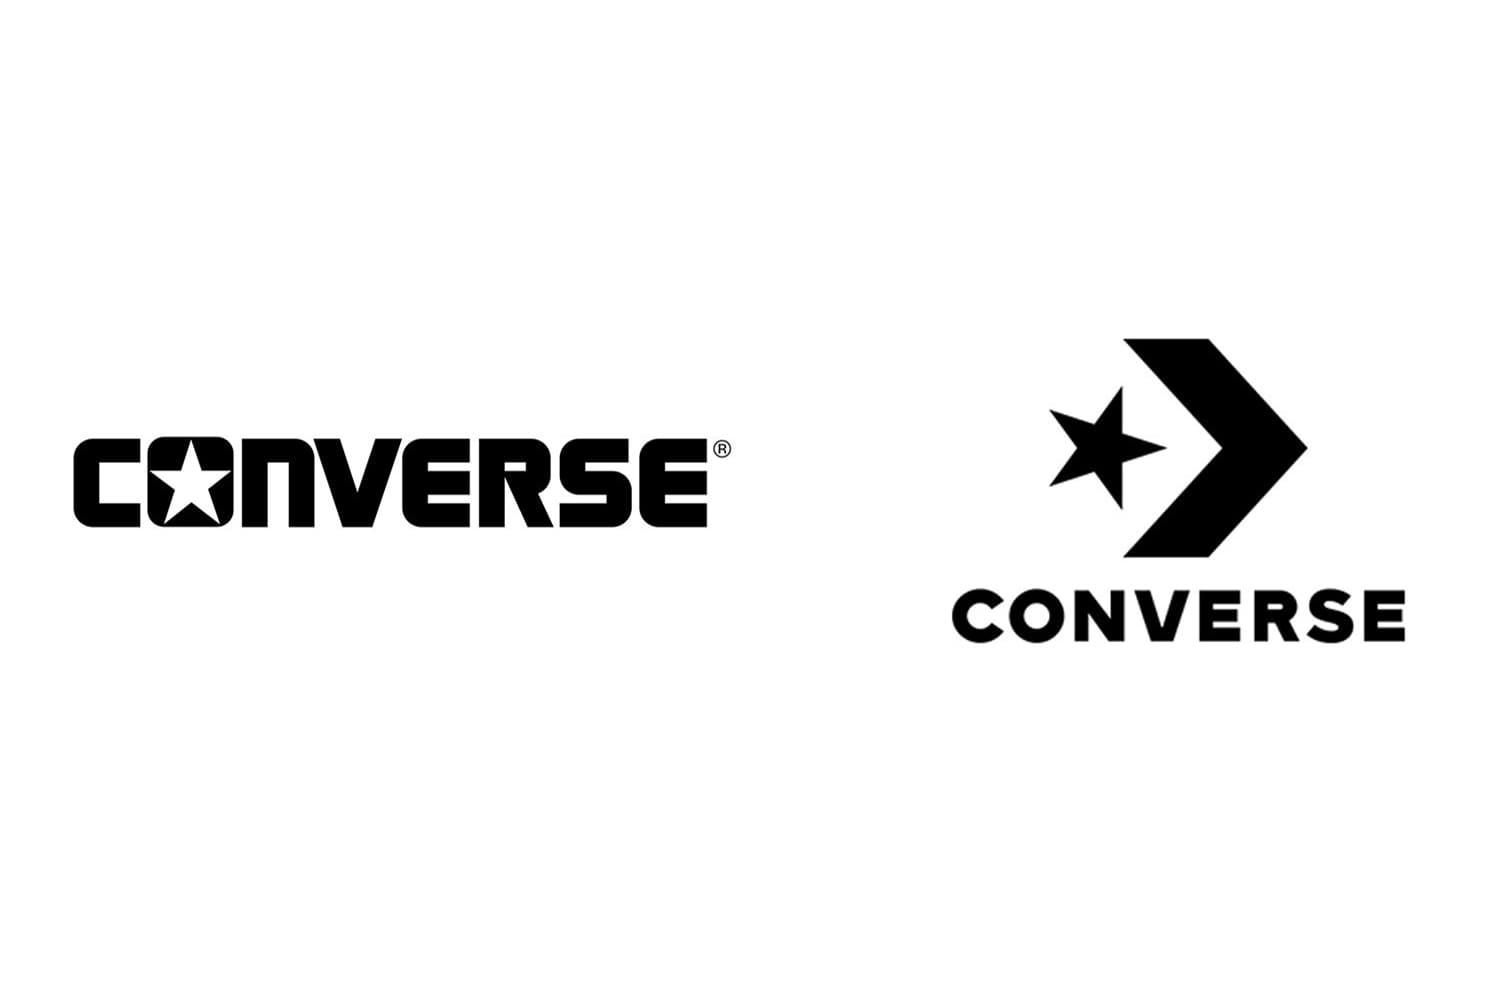 Converse 的新 Logo 背後有何歷史故事?